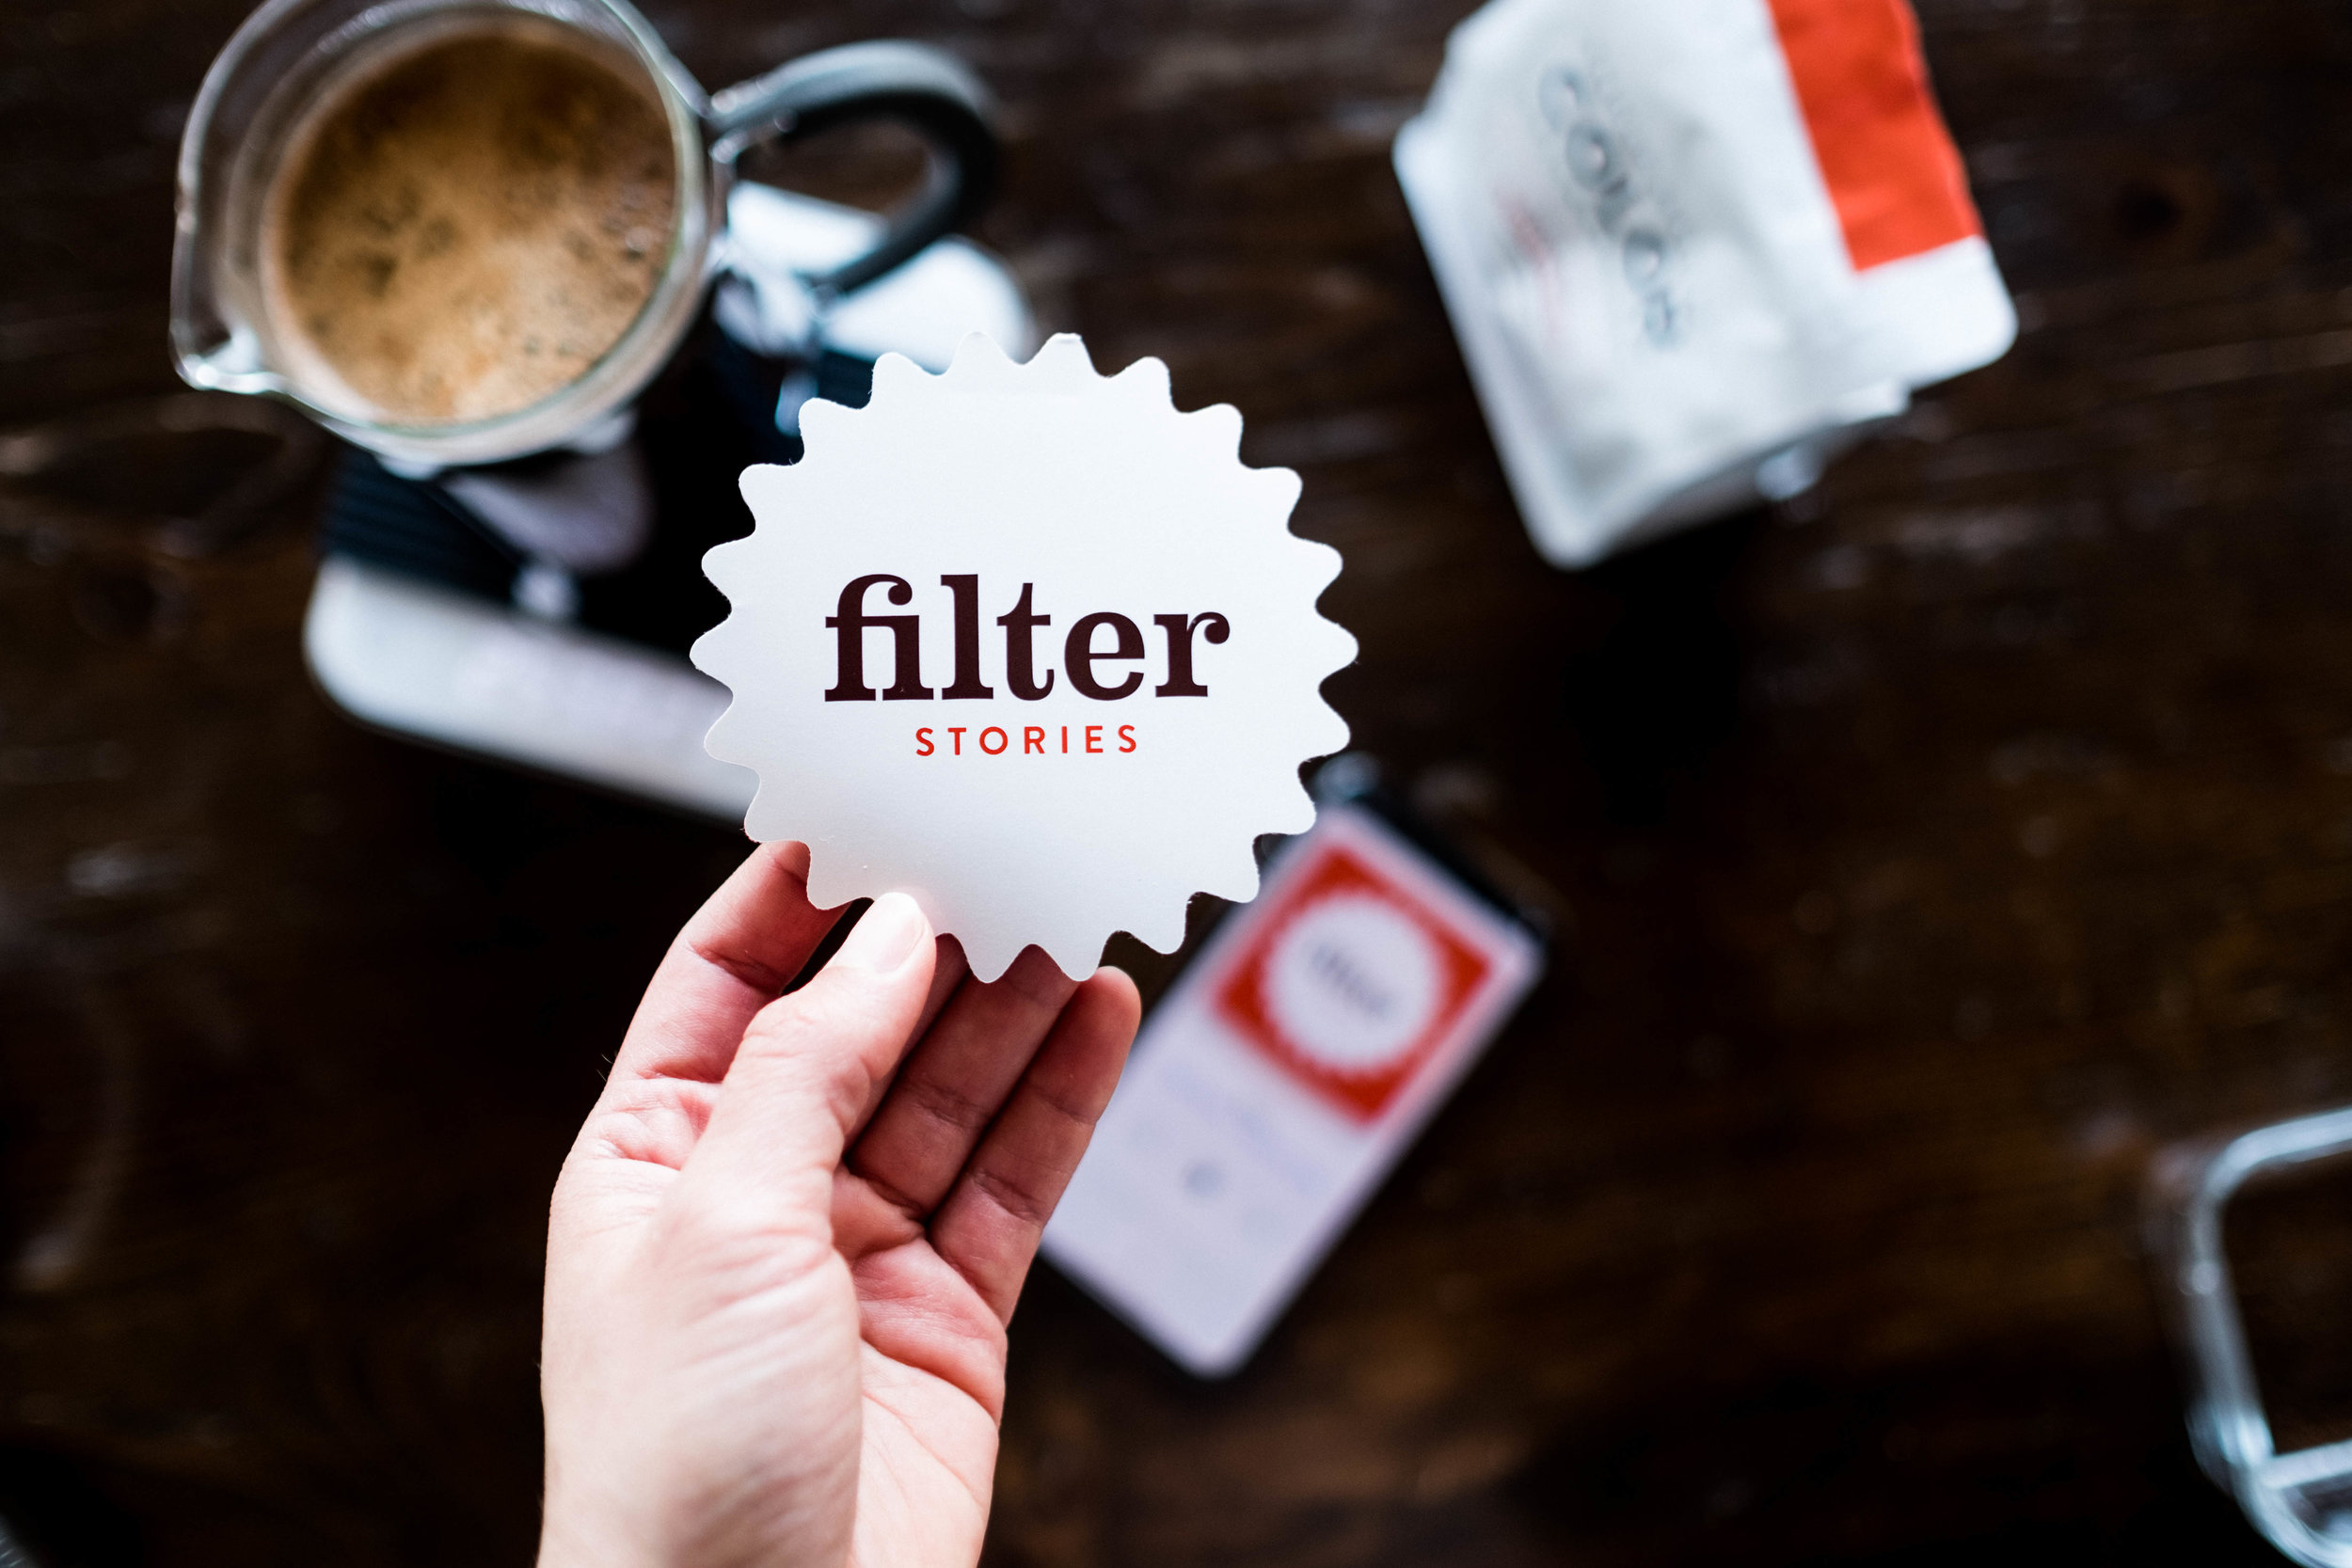 FilterStoriesPodcast_TheLittleBlackCoffeeCup-19.jpg